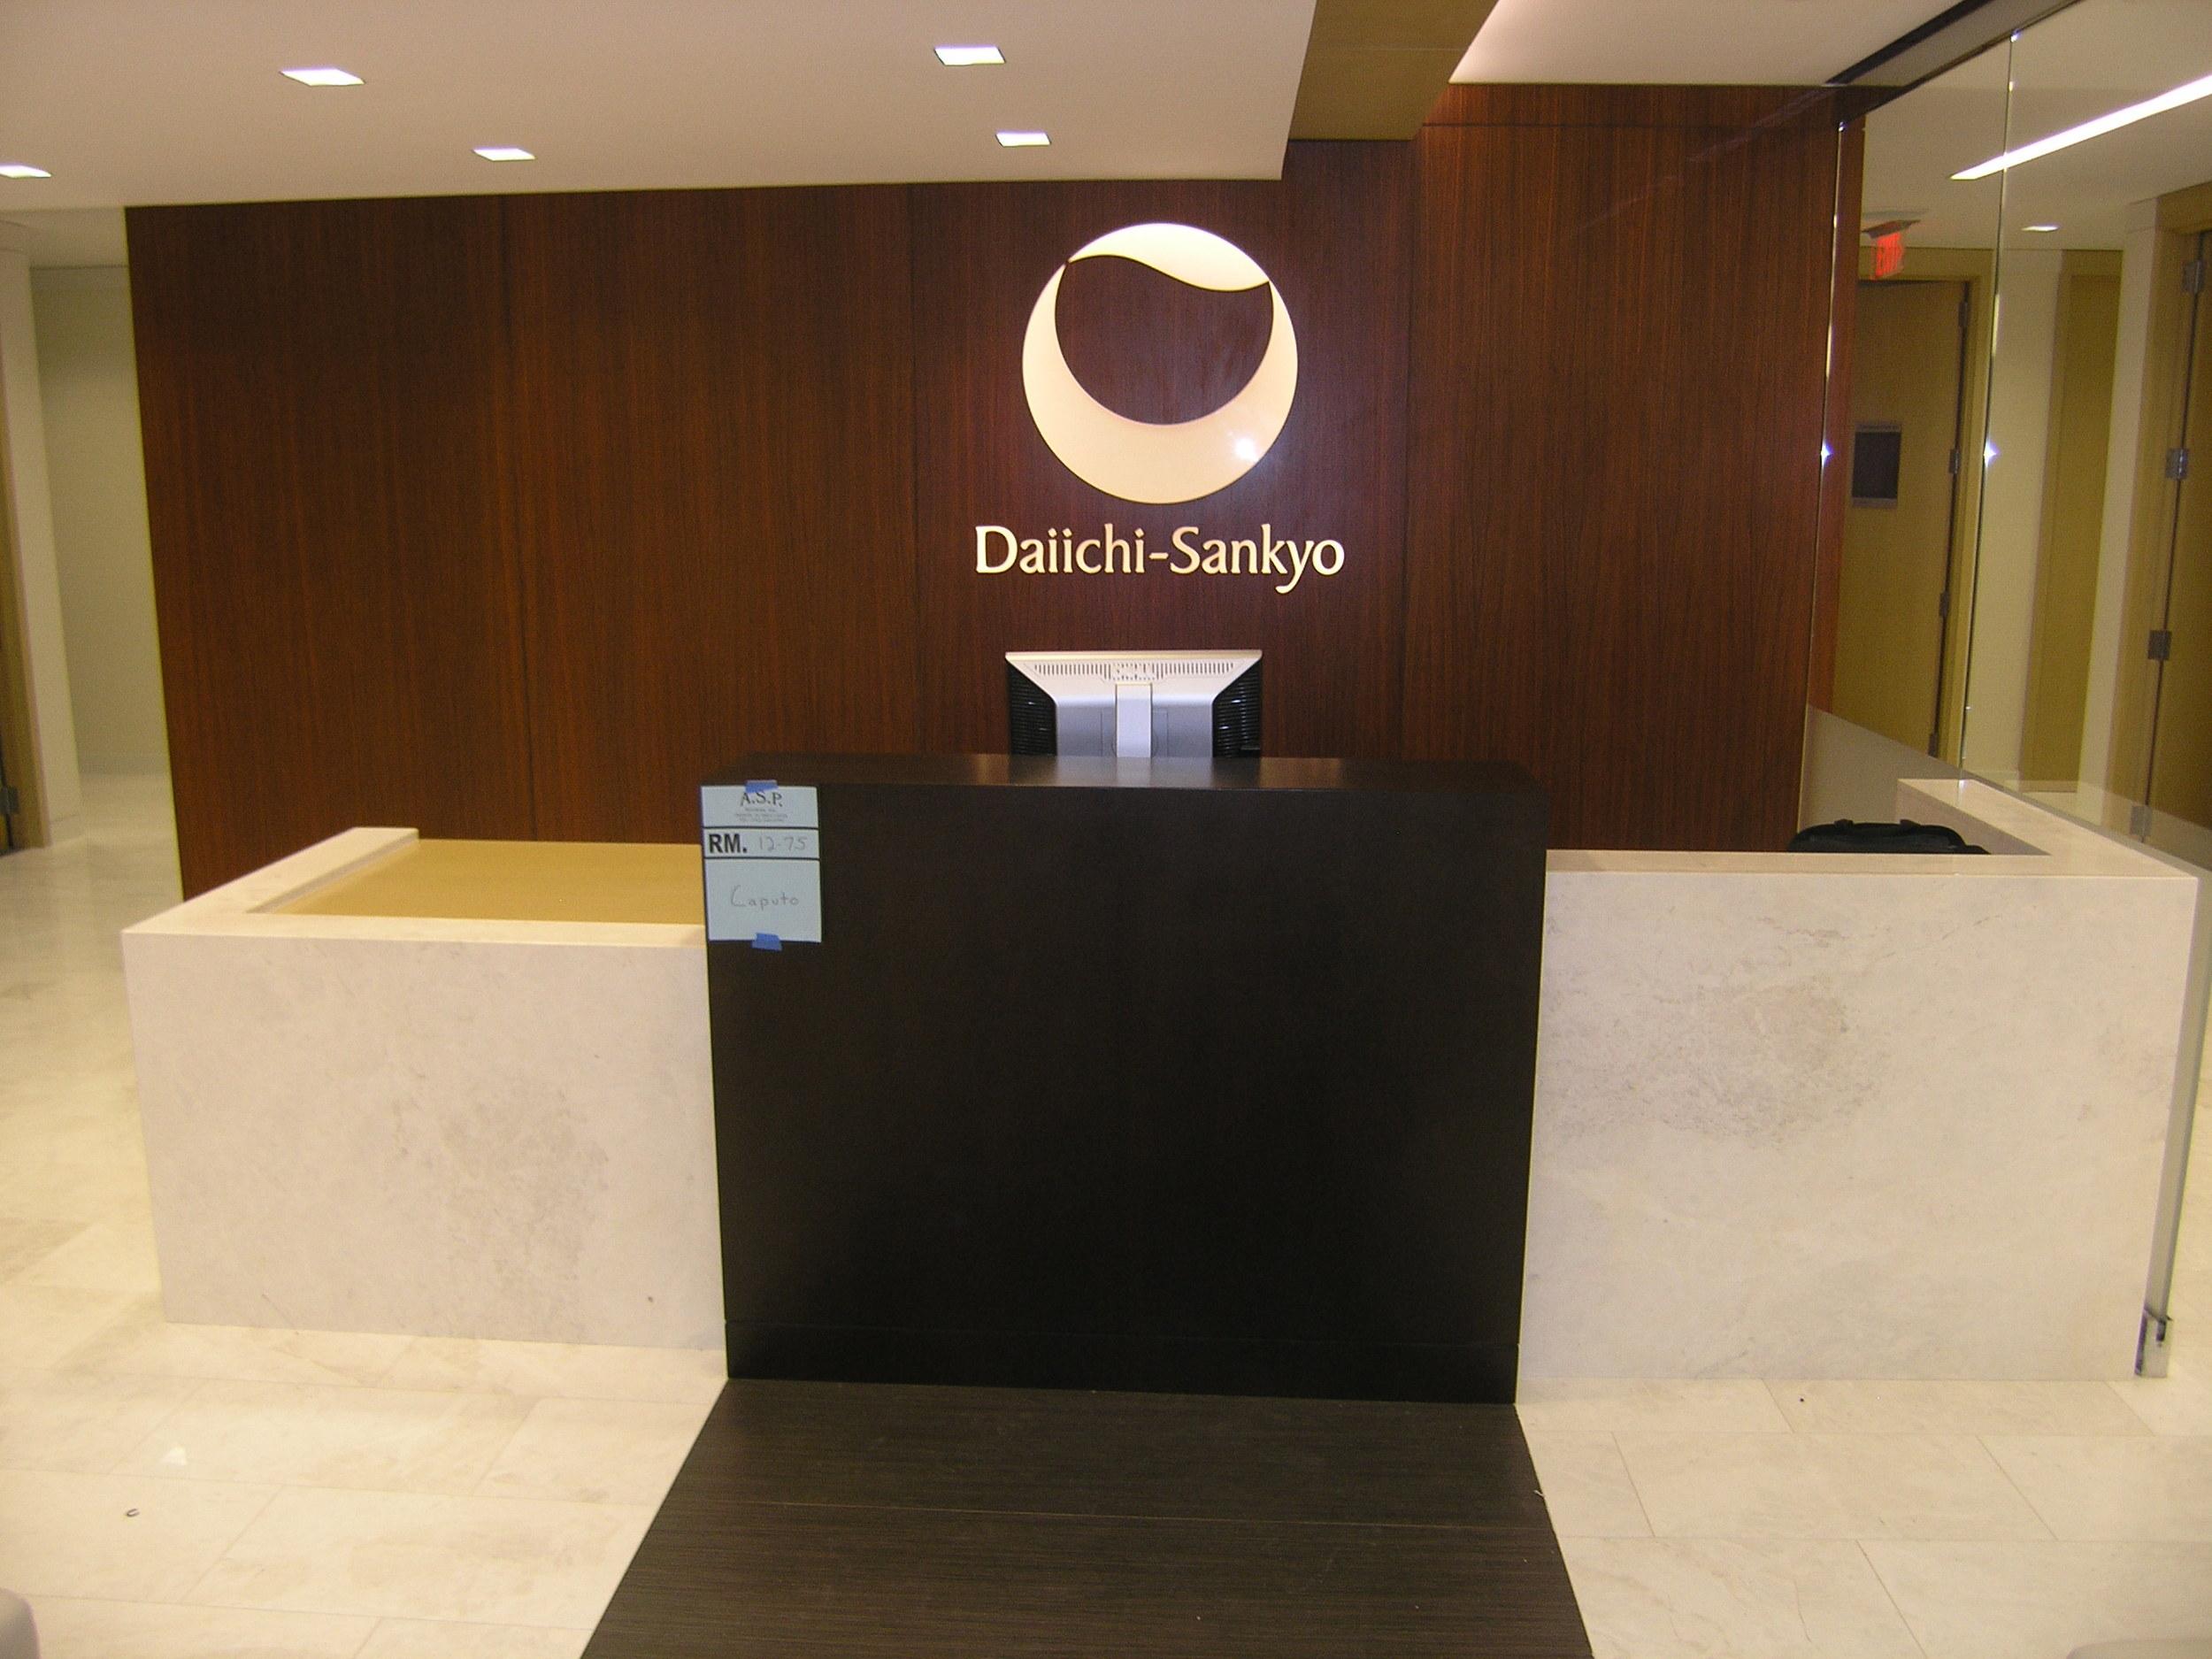 m_projects_0- Old Jobs_Daiichi Sankyo_DAIICHI SANKIO JOB 15143_PIX_Final_P1260239.JPG